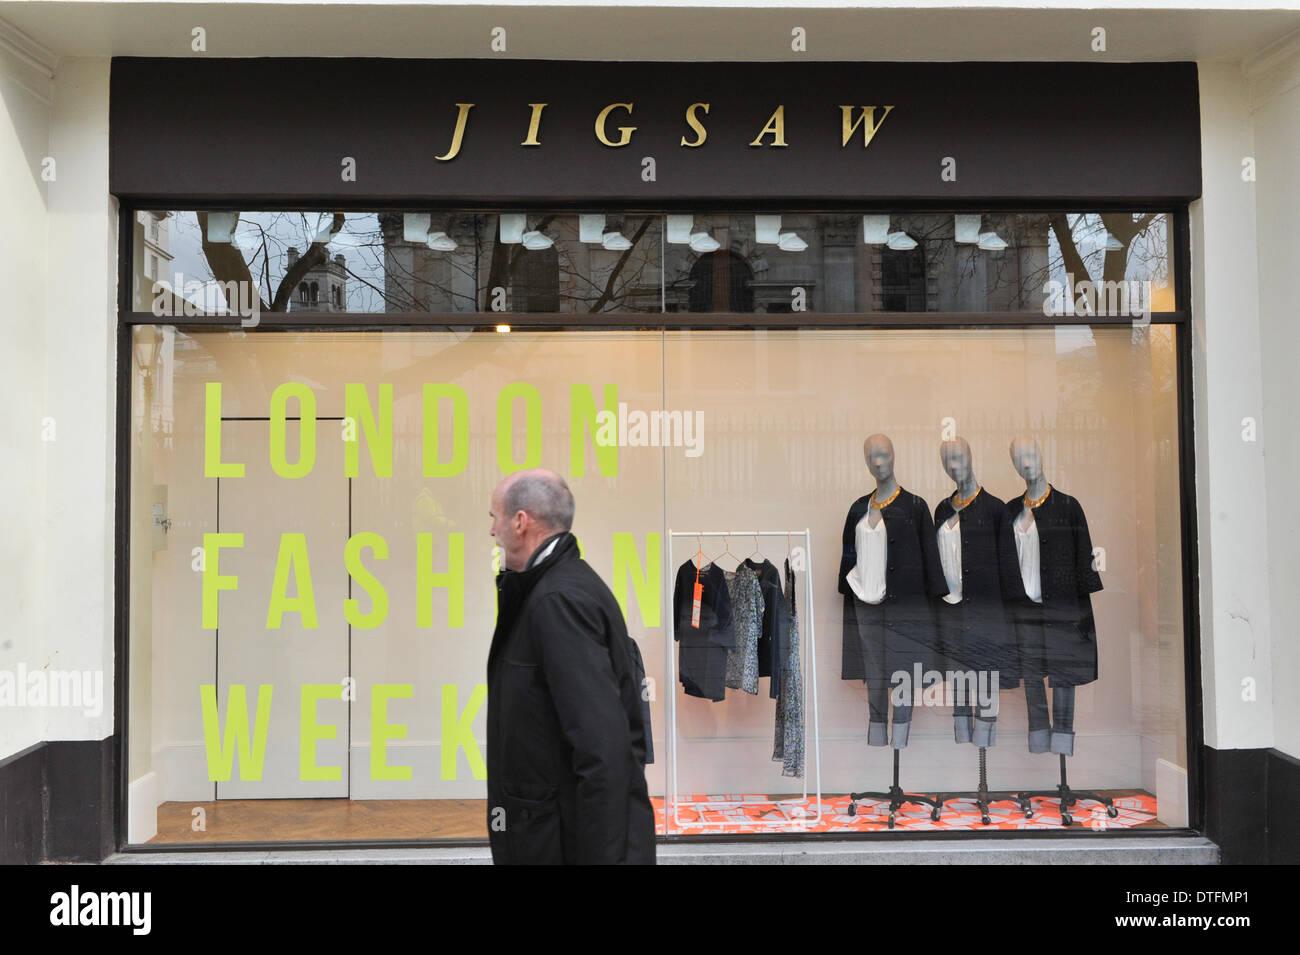 The Strand, London, UK. 17th Feb 2014. The window of Jigsaw for London Fashion Week. Credit:  Matthew Chattle/Alamy Stock Photo